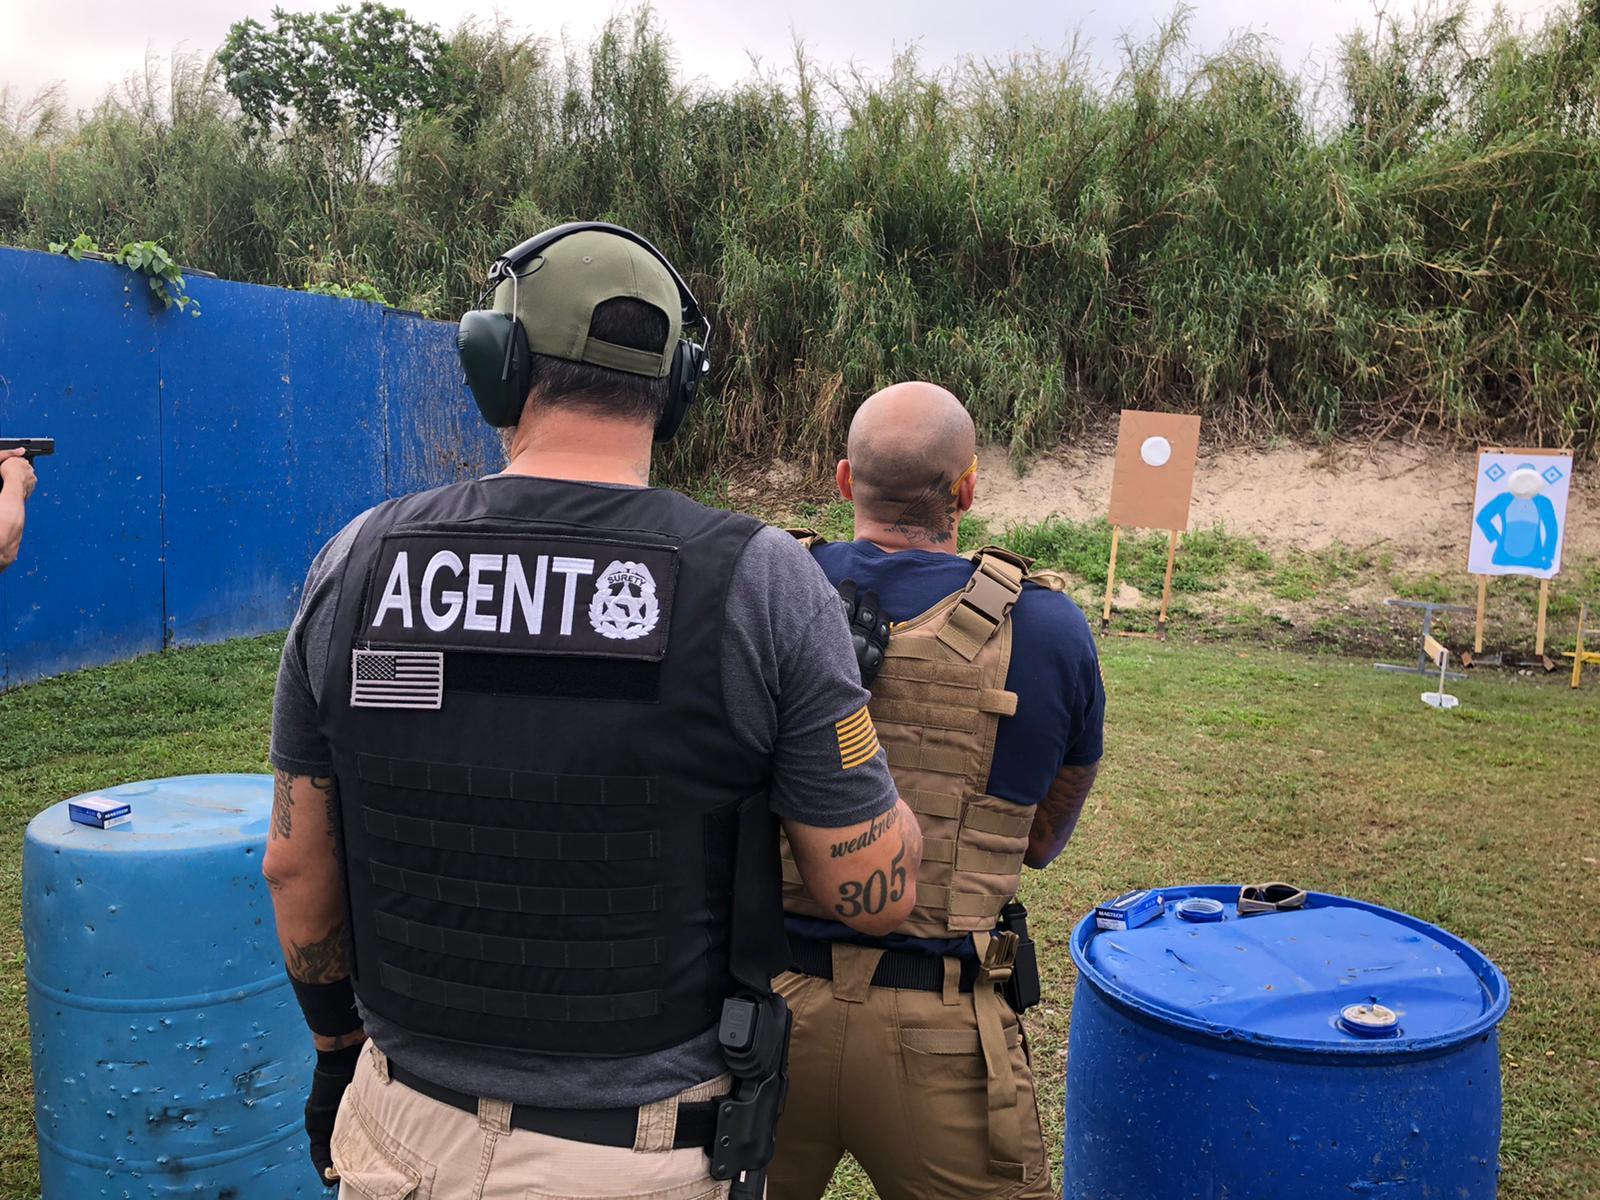 Firearms training Miami Tatctopsusa